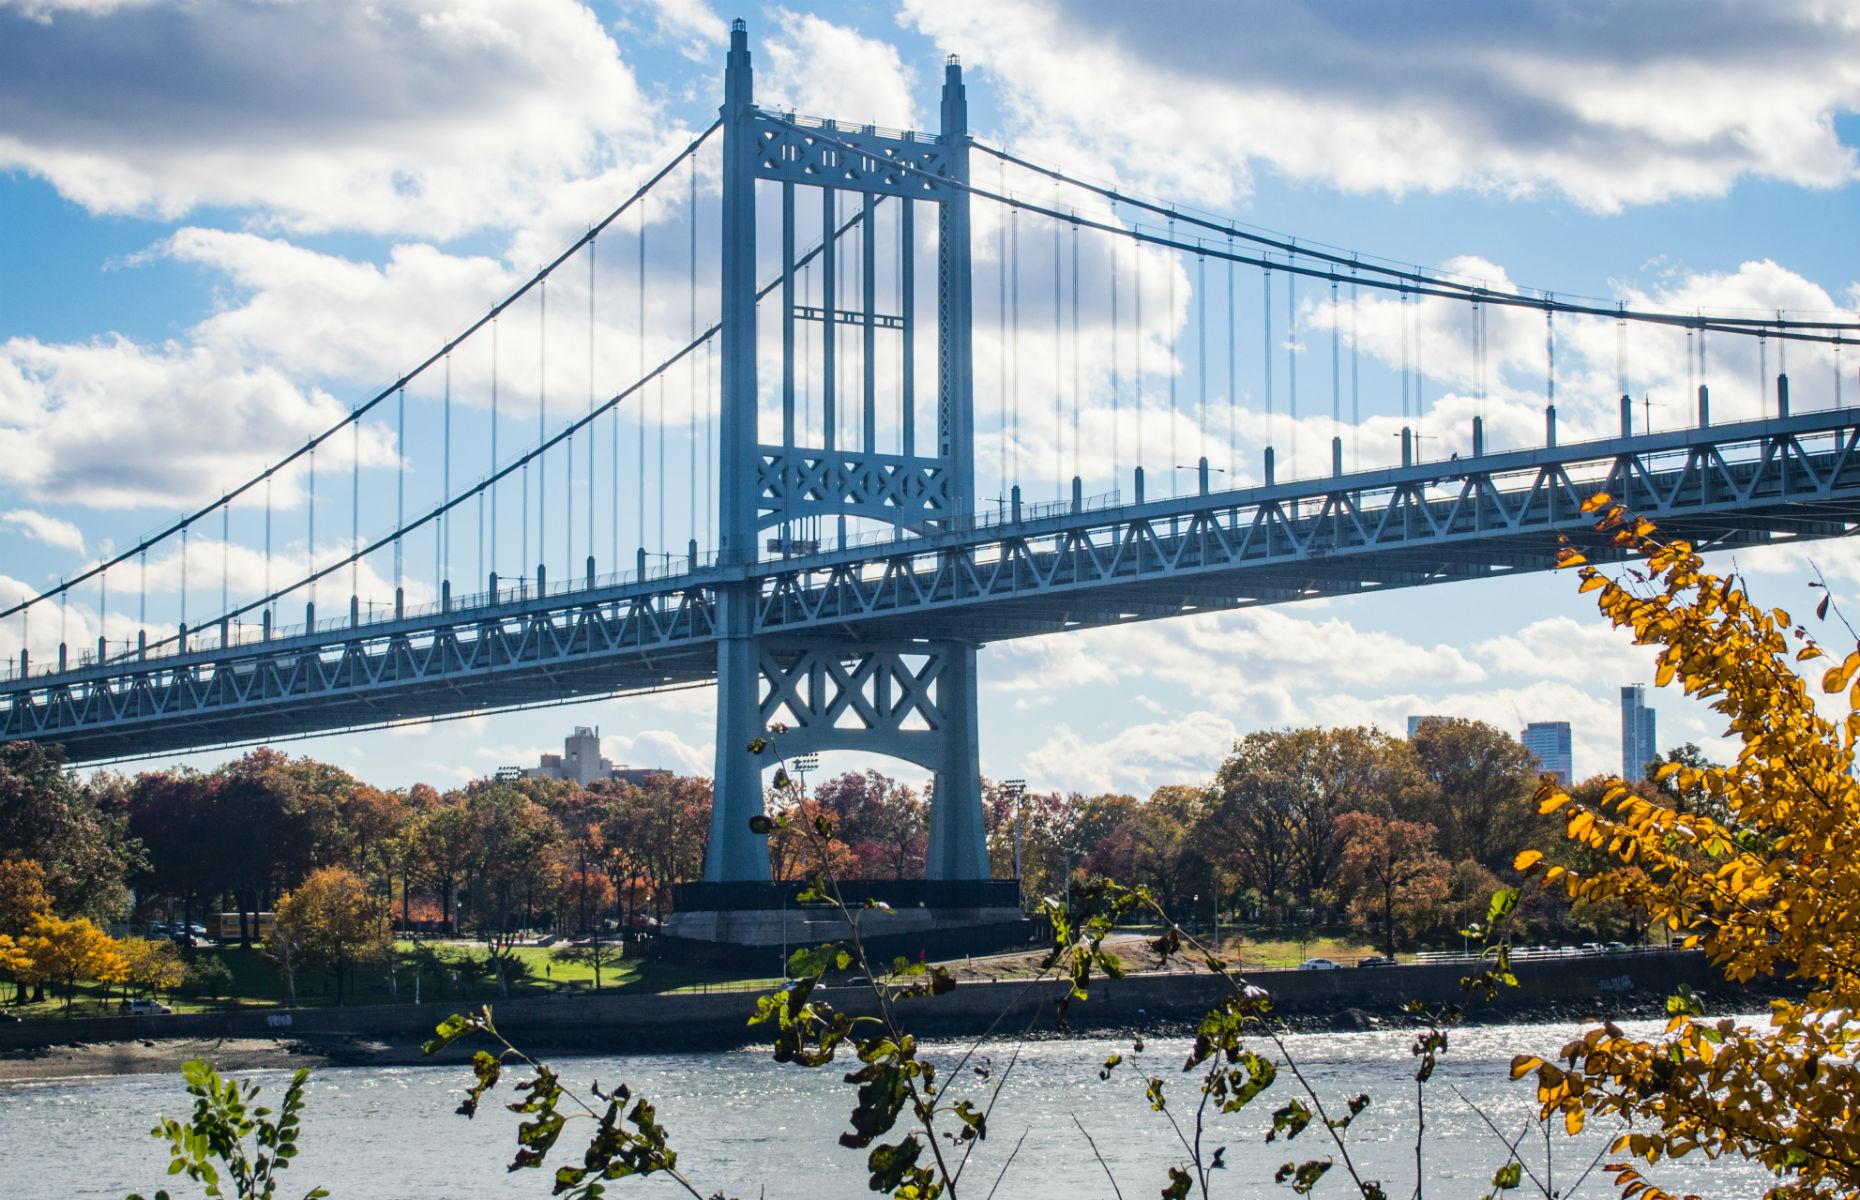 Robert F Kennedy Bridge